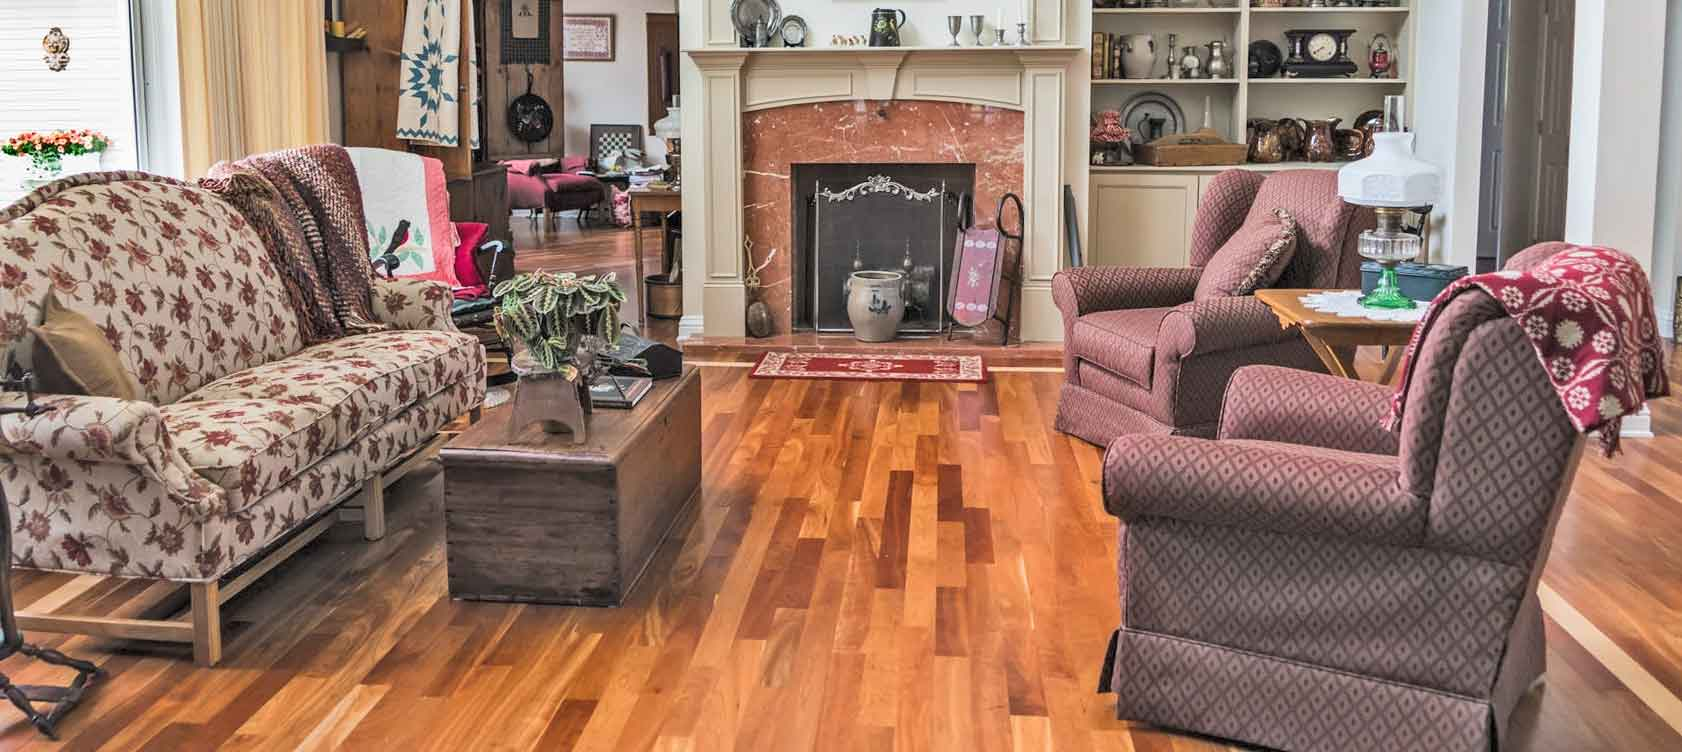 Hardwood-Floors---Keeping-them-Clean